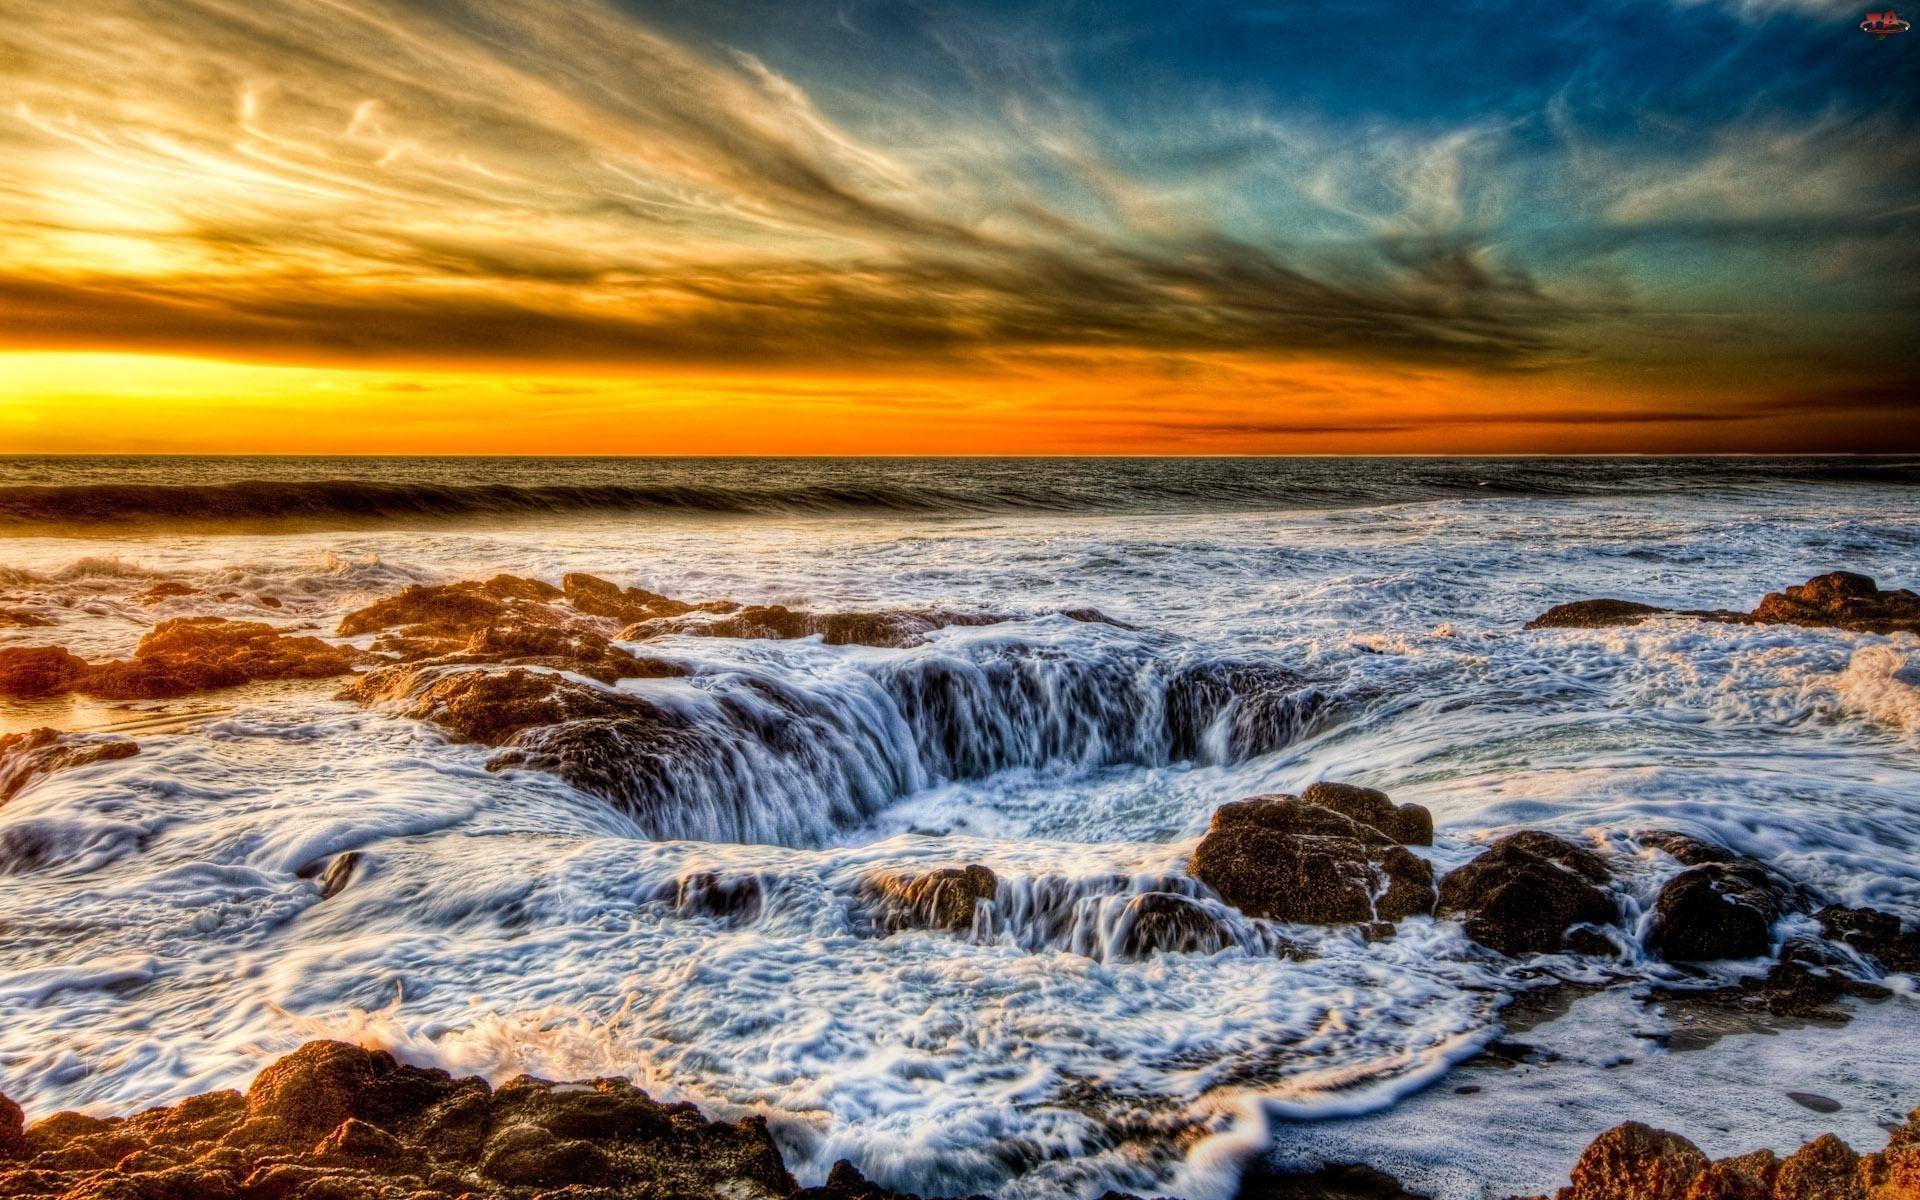 Morze, Słońca, Skały, Zachód